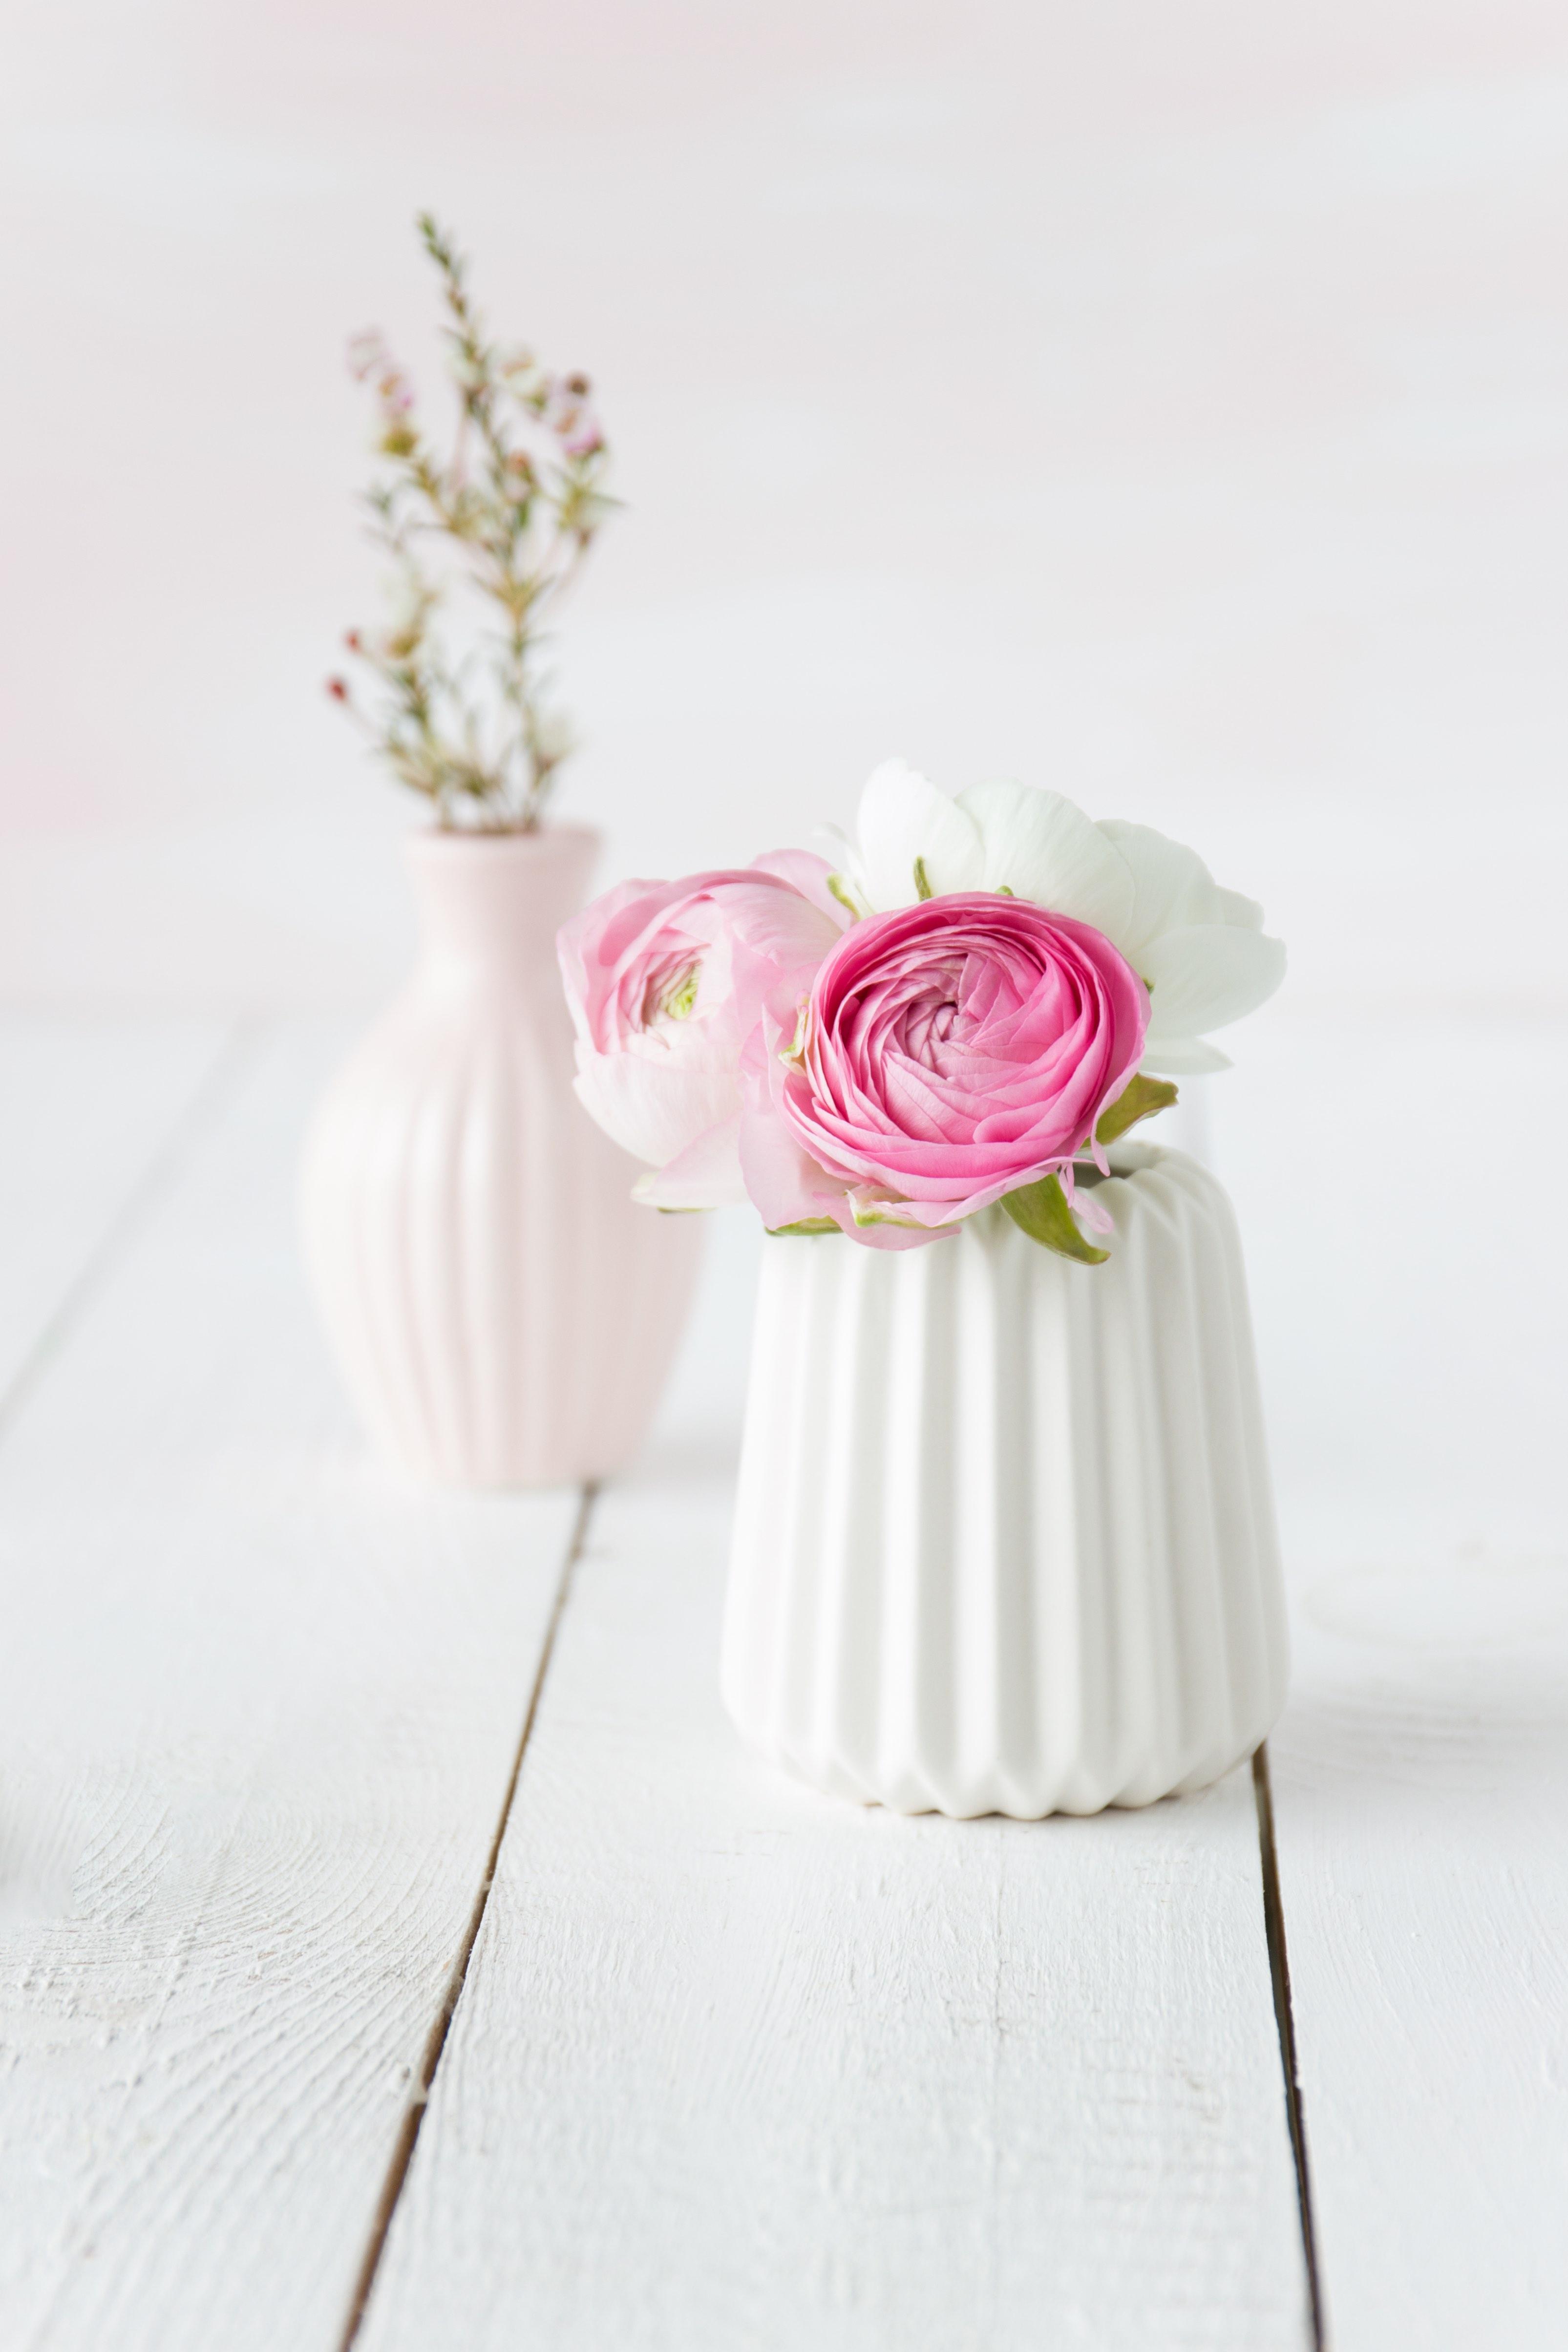 Ranunkeln in weißer Vase  | Emma´s Lieblingsstücke